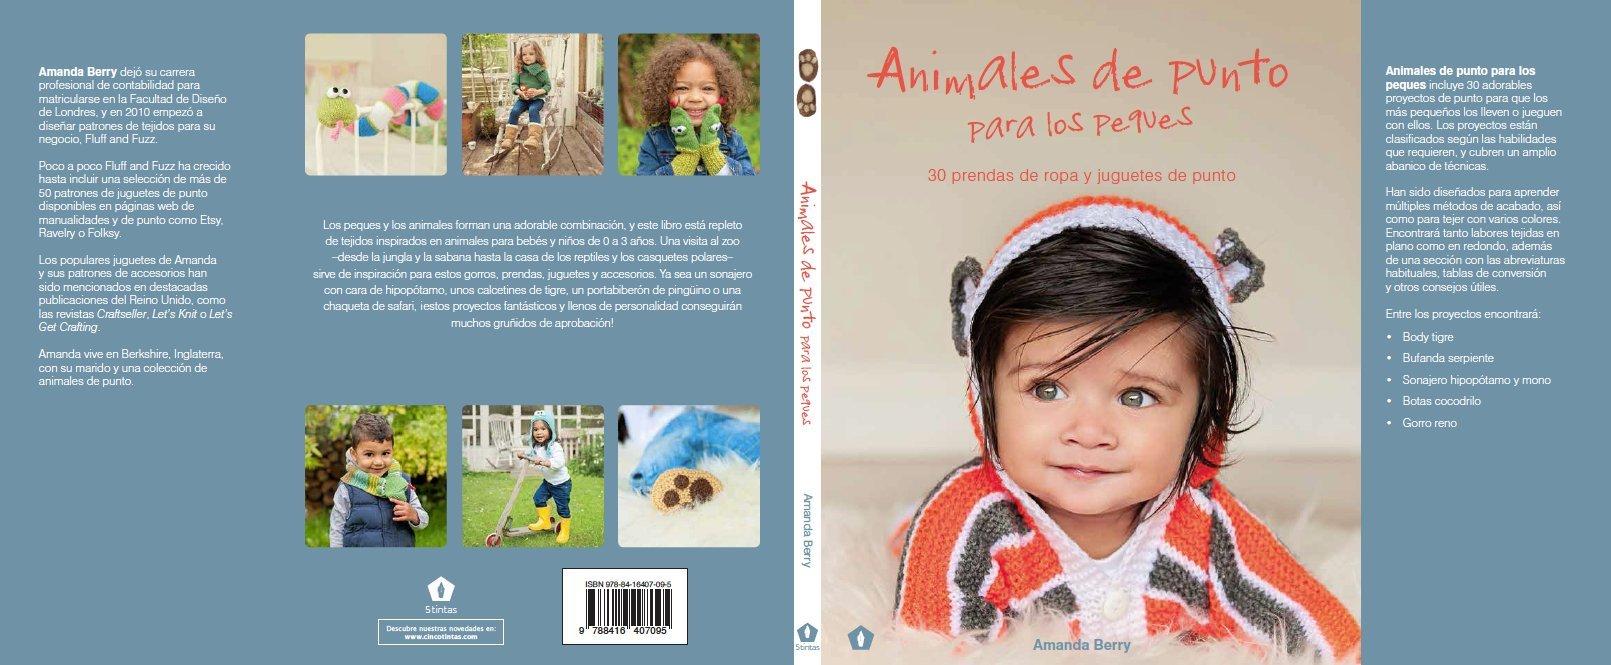 Animales de punto para los peques (Spanish Edition) (Spanish) Paperback – January 1, 2016